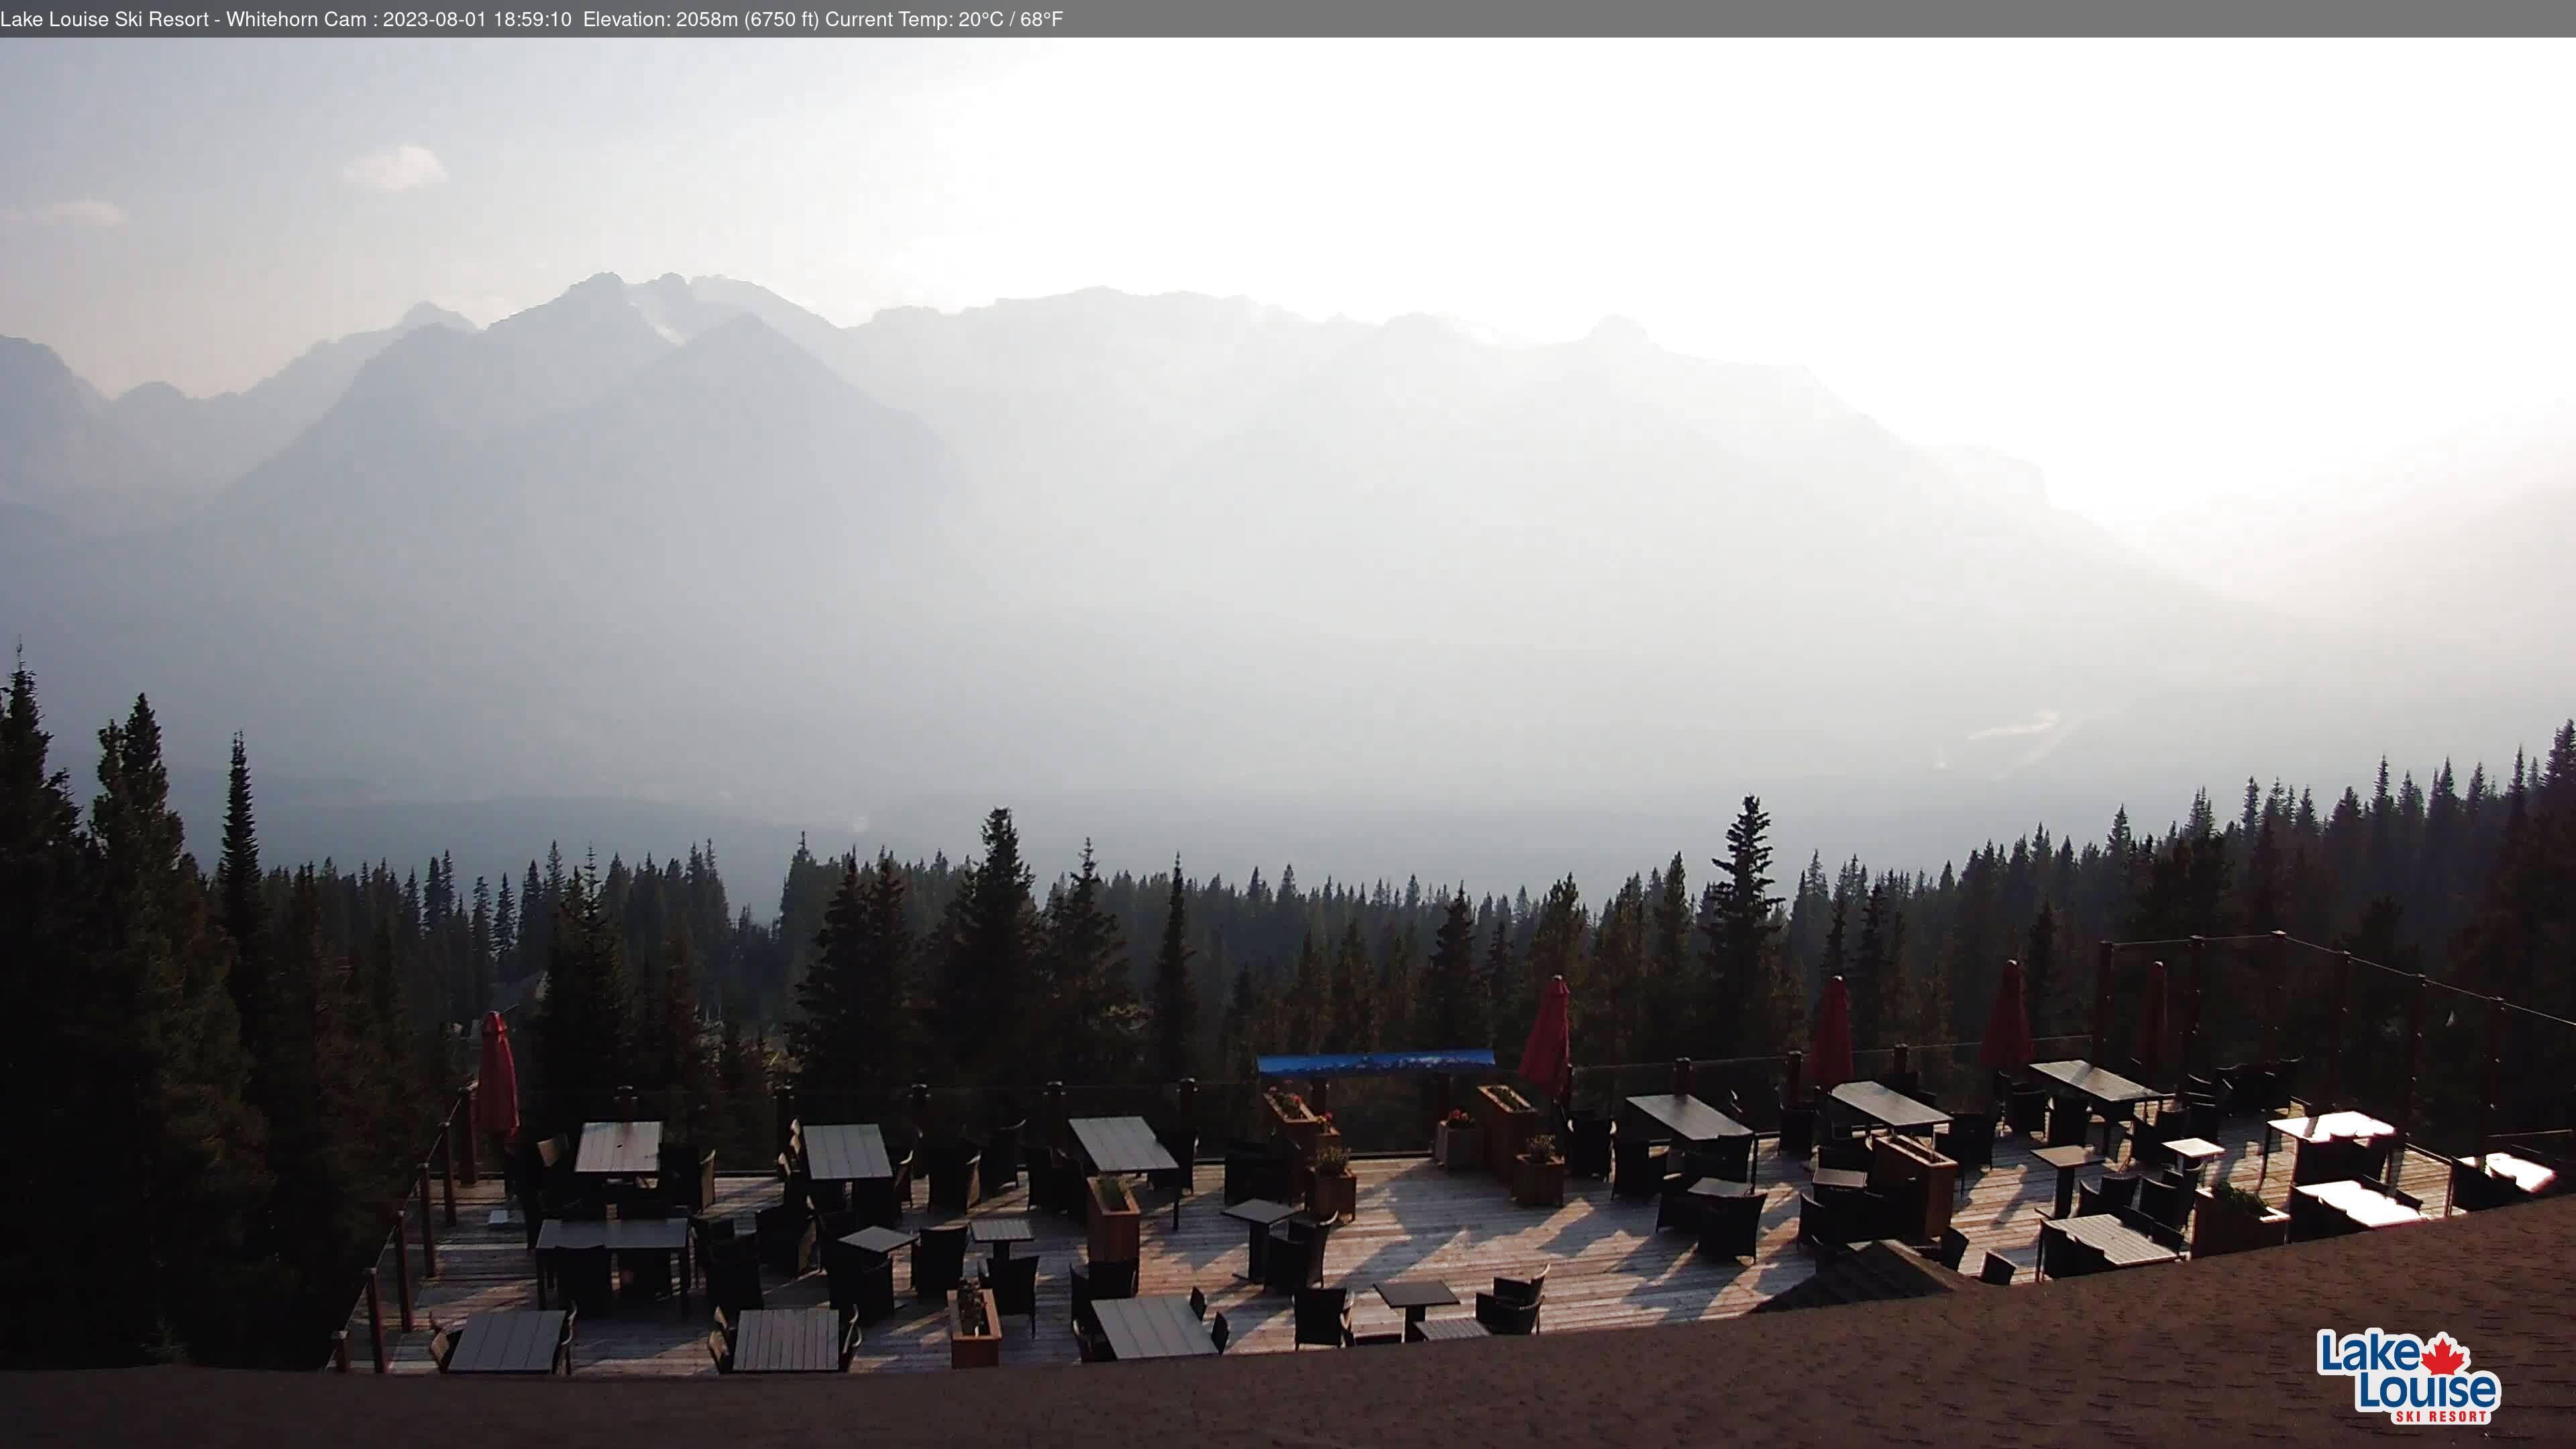 Webcam en Whitehorn Lodge, Lake Louise (Canadá)